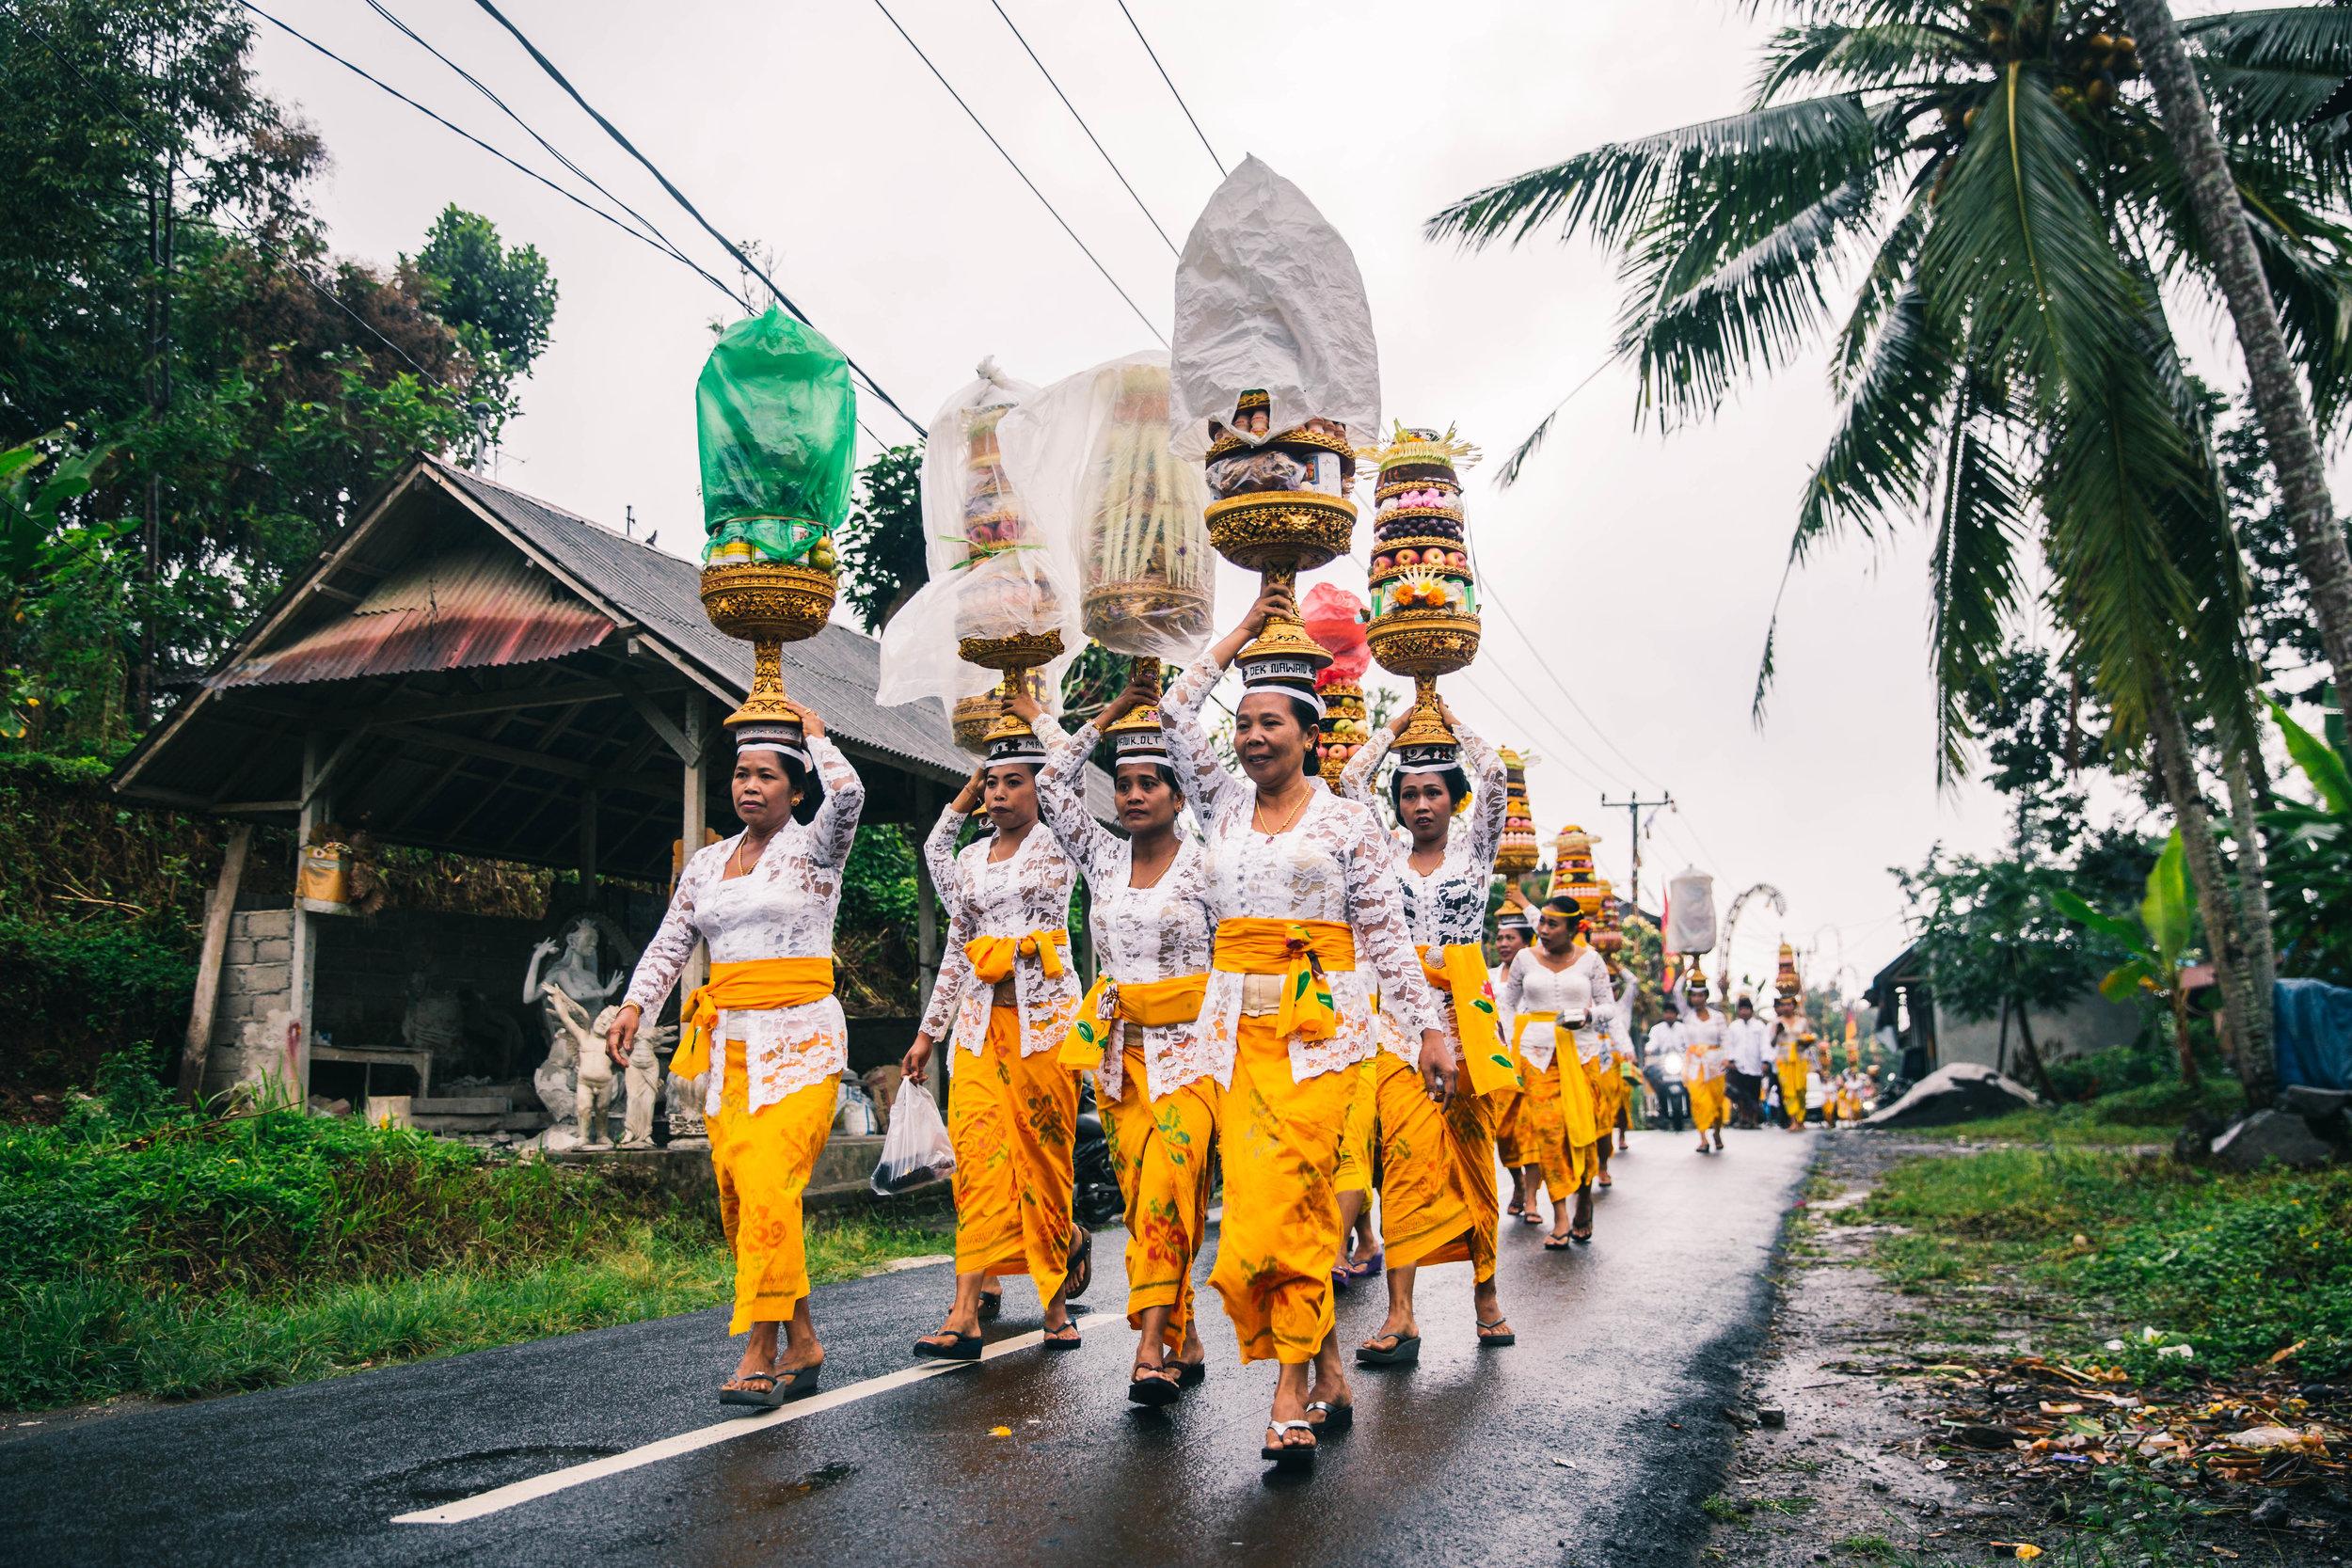 20180619-Bali-Wang-00865.jpg